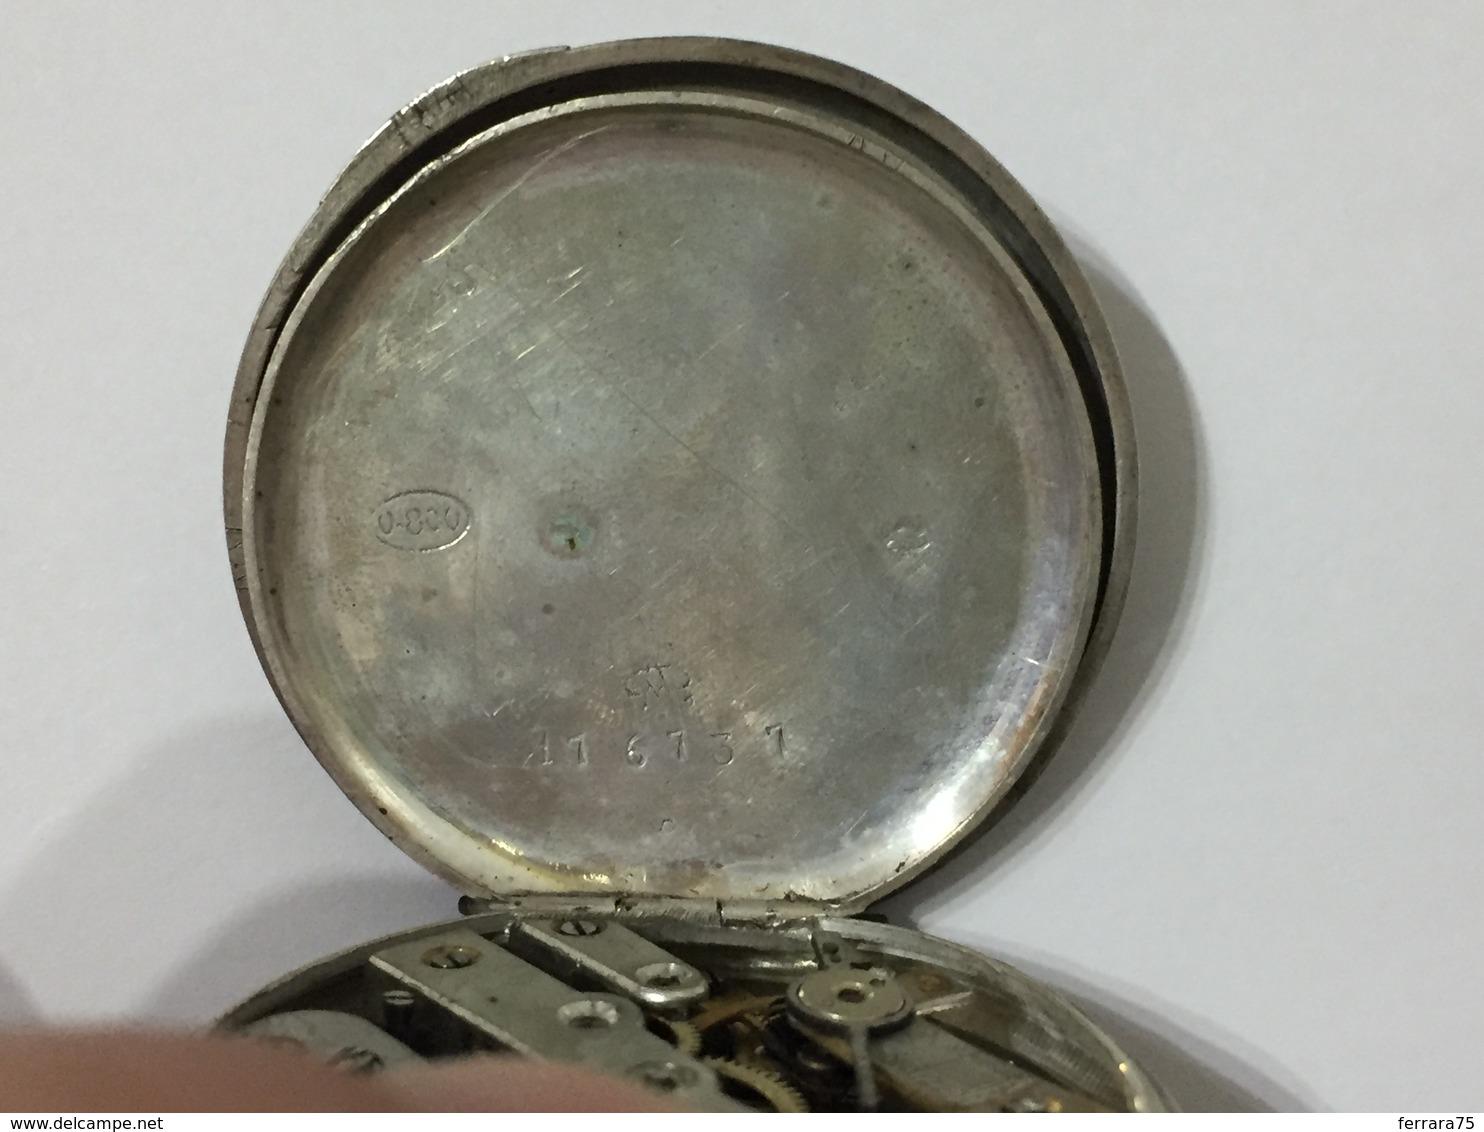 OROLOGIO DA TASCA POCKET WATCH CYLINDRE 10 RUBIS A CARICA MANUALE AG.800 - Orologi Antichi